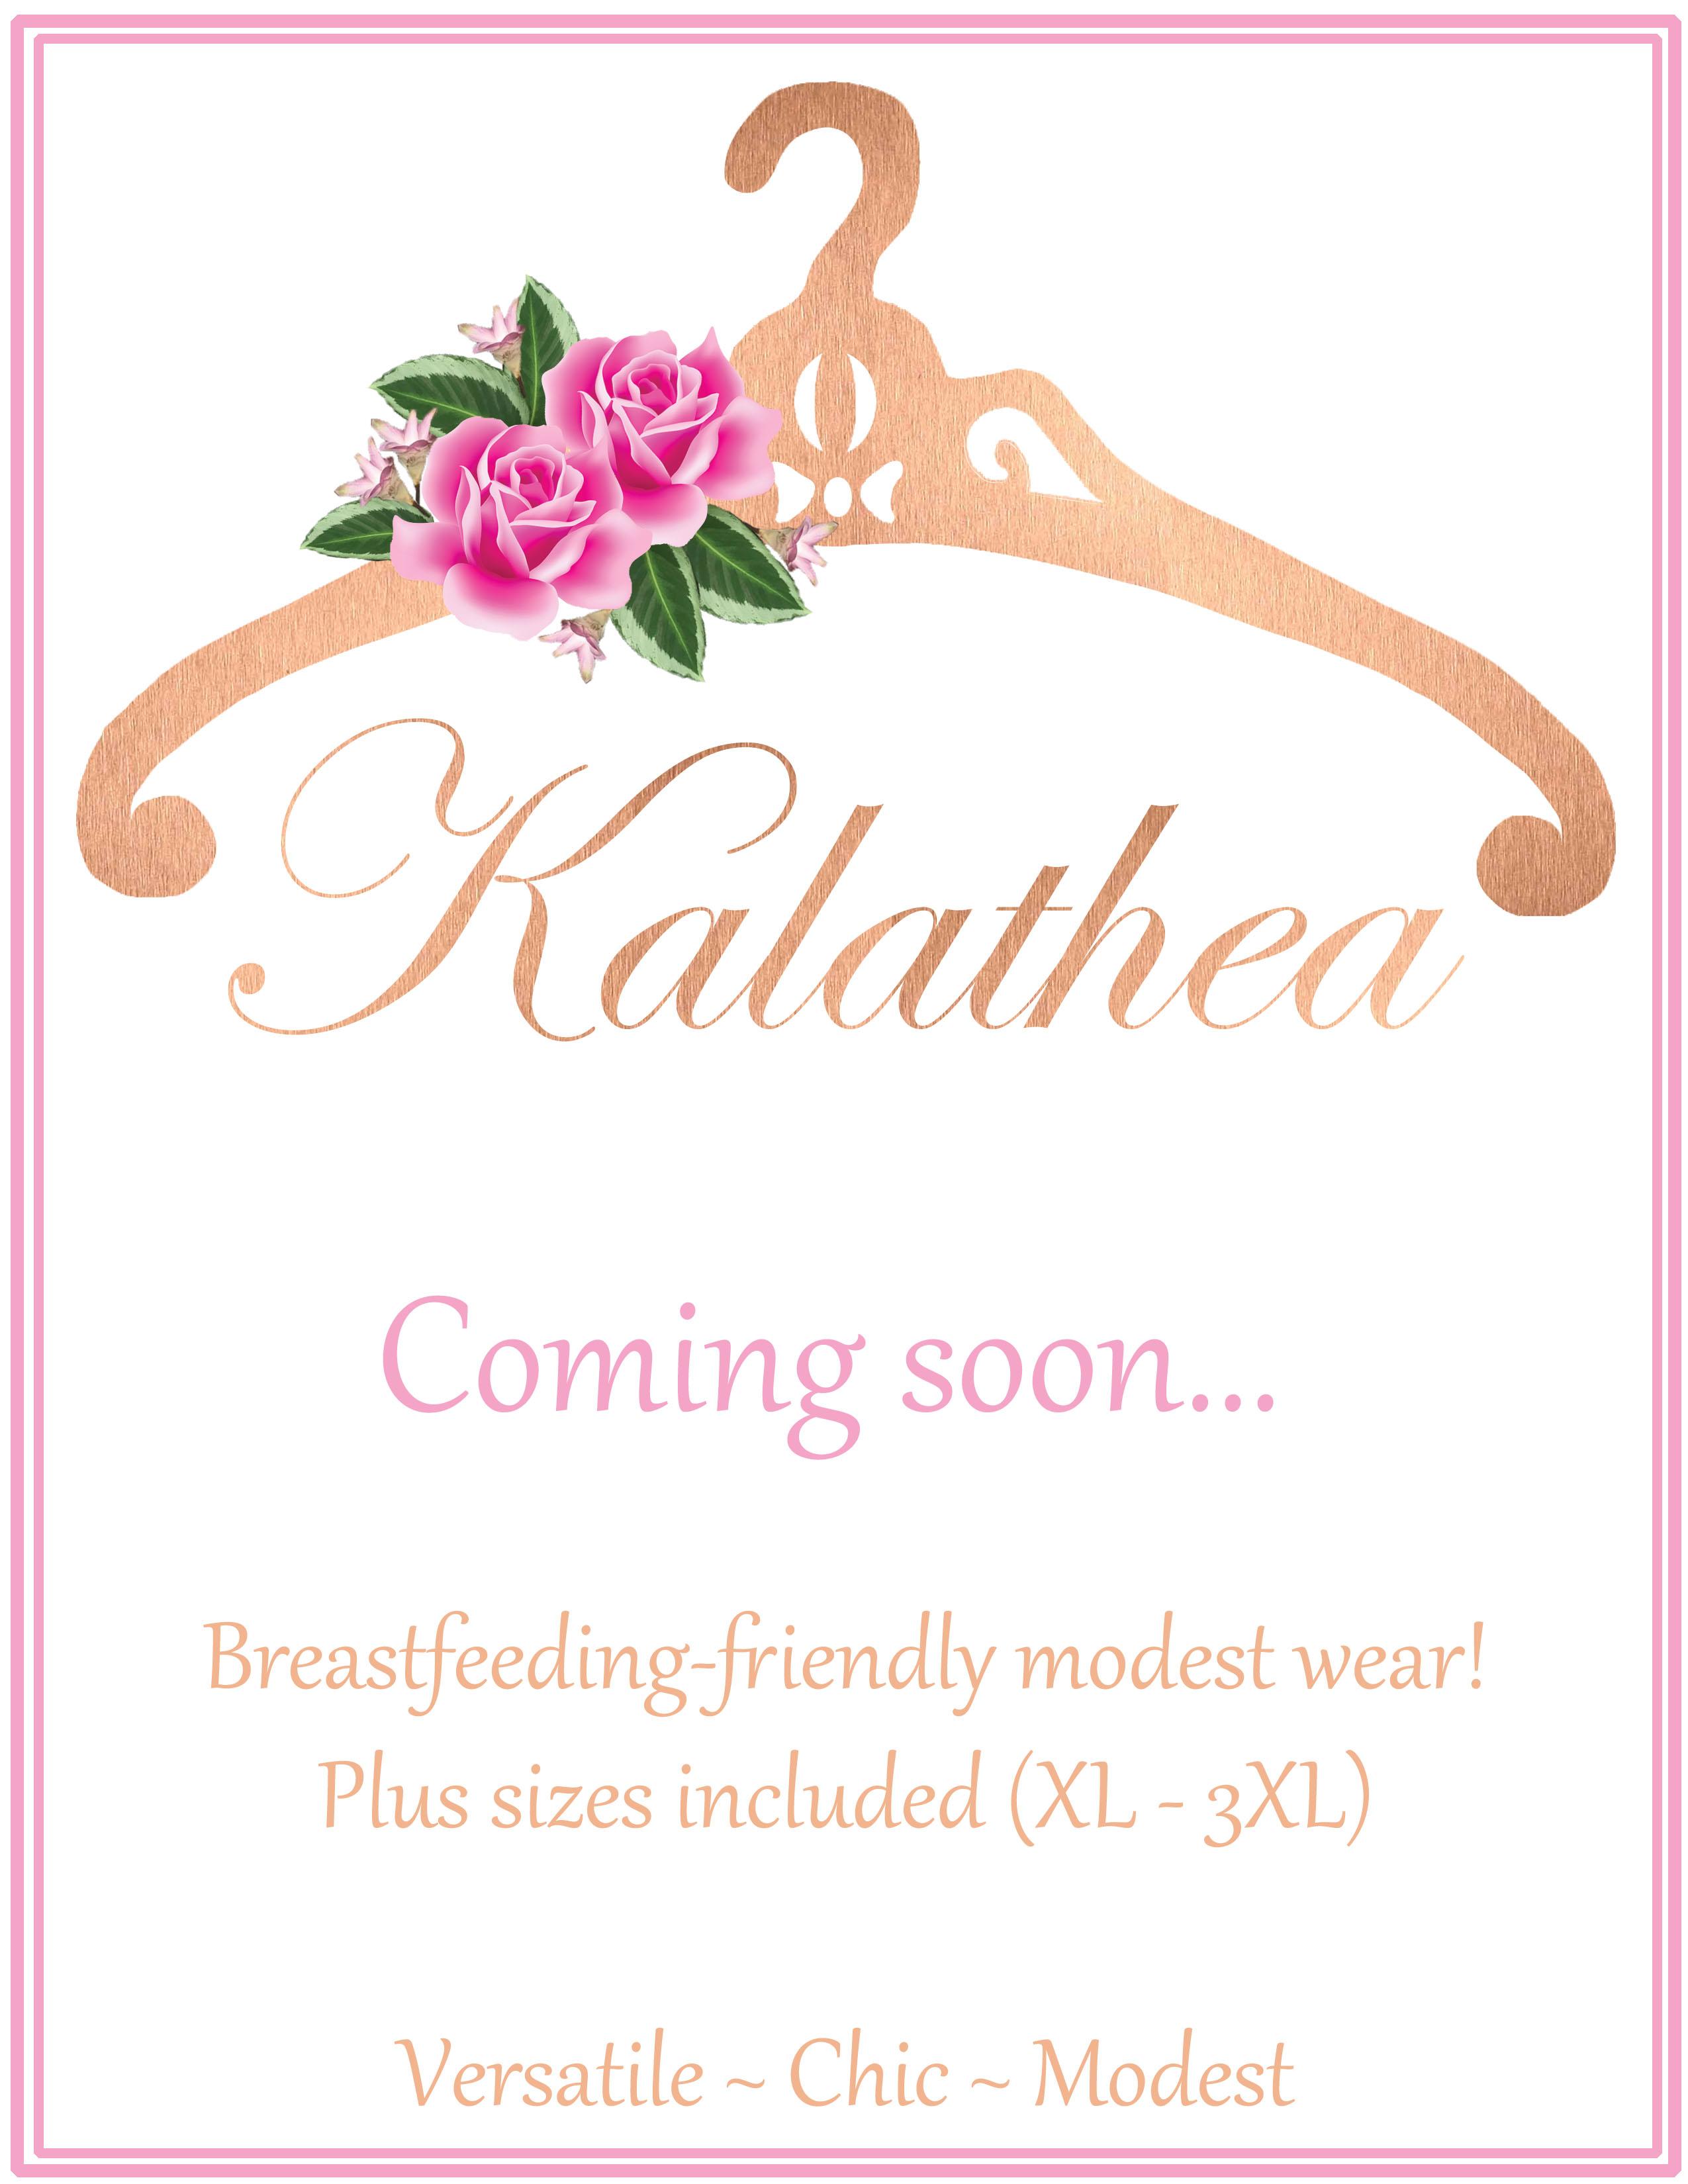 Kalathea-coming-soon-PSHOP